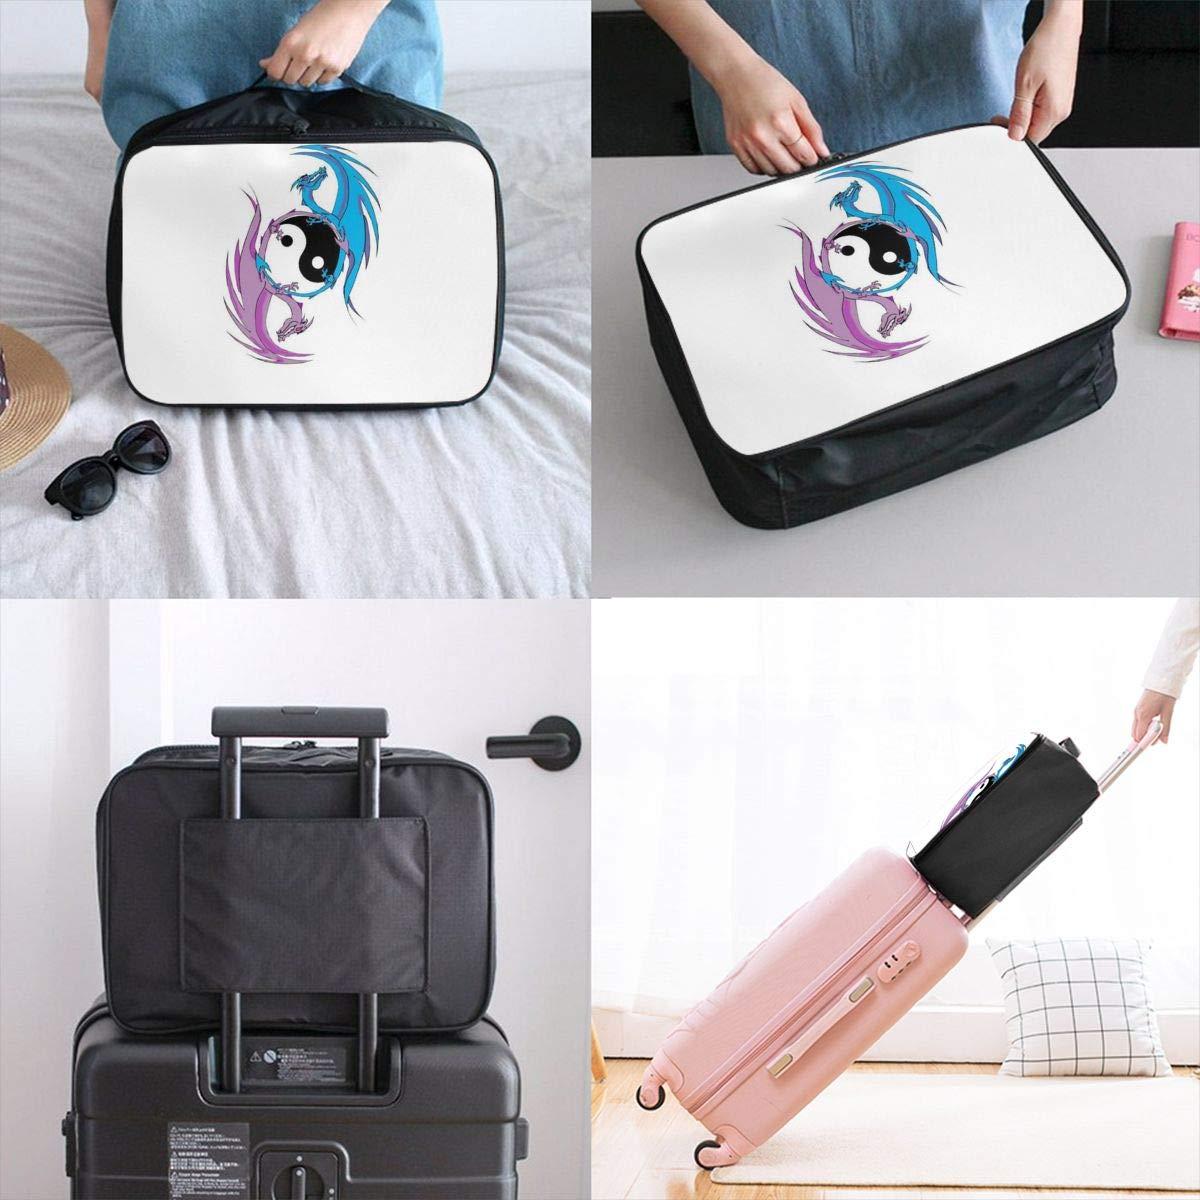 Dragon Yin Yang Customize Casual Portable Travel Bag Suitcase Storage Bag Luggage Packing Tote Bag Trolley Bag